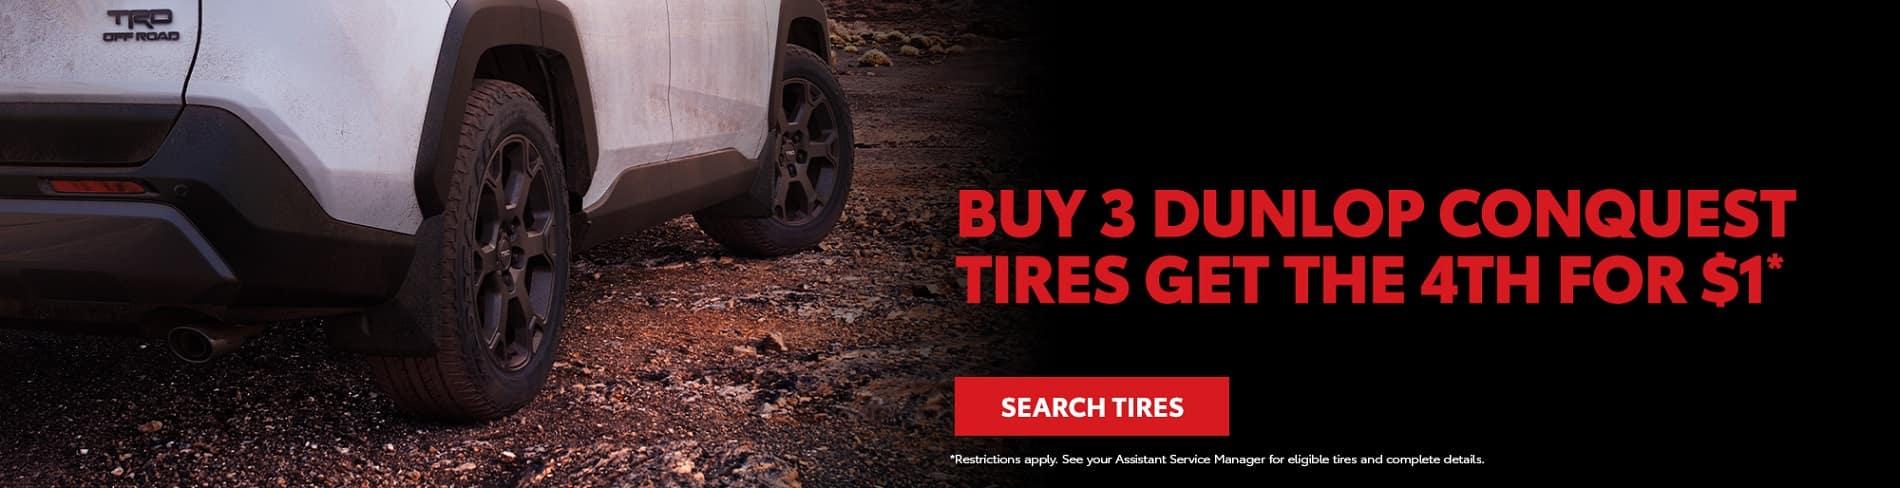 Shop Toyota Tires